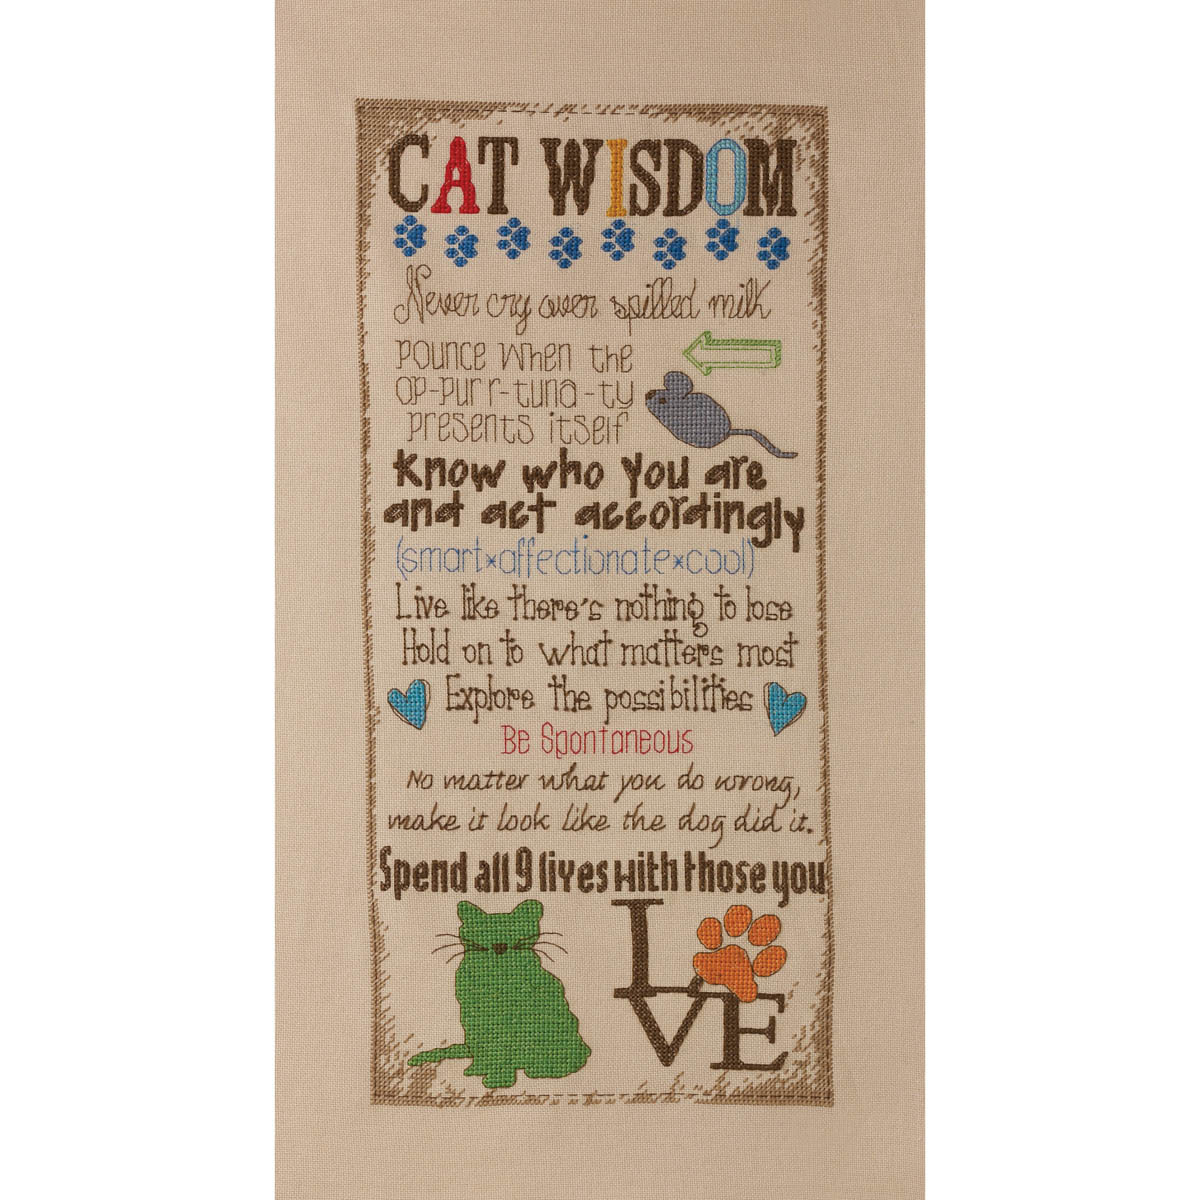 Bucilla ® Counted Cross Stitch - Picture Kits - Cat Wisdom - 45851